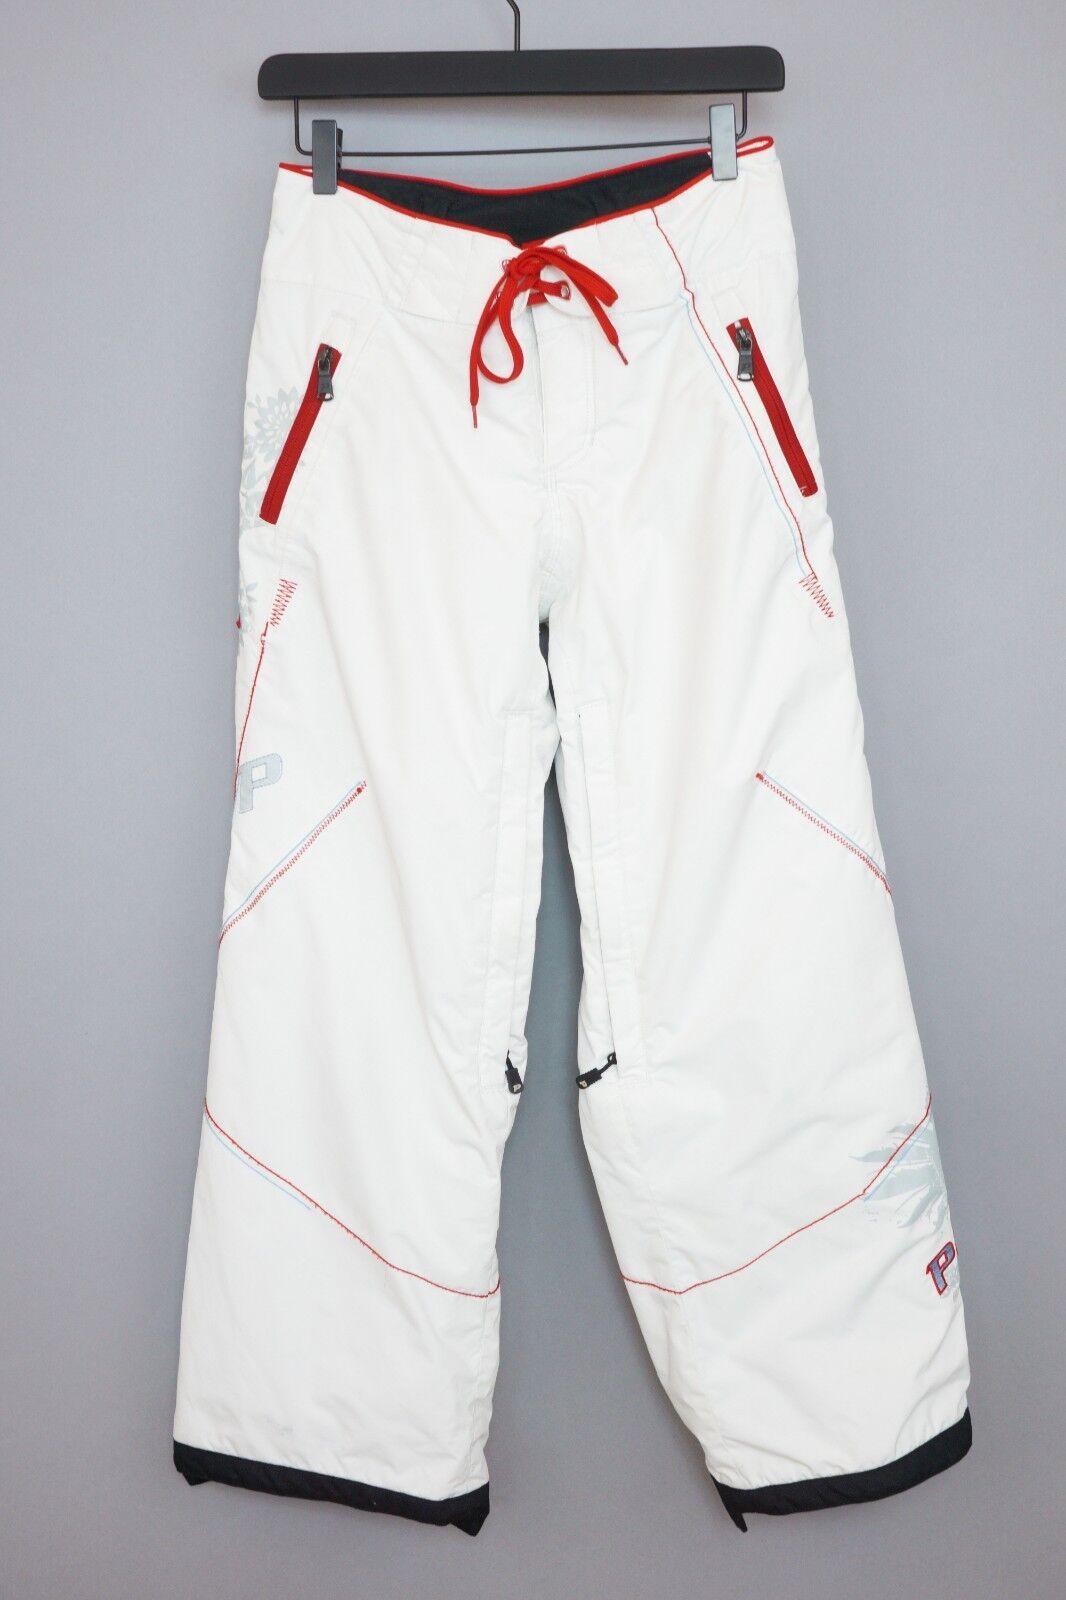 Mujer Peak Performance Pantalones Thermolite Snowboard Esquí XS W28 L29 XIJ548